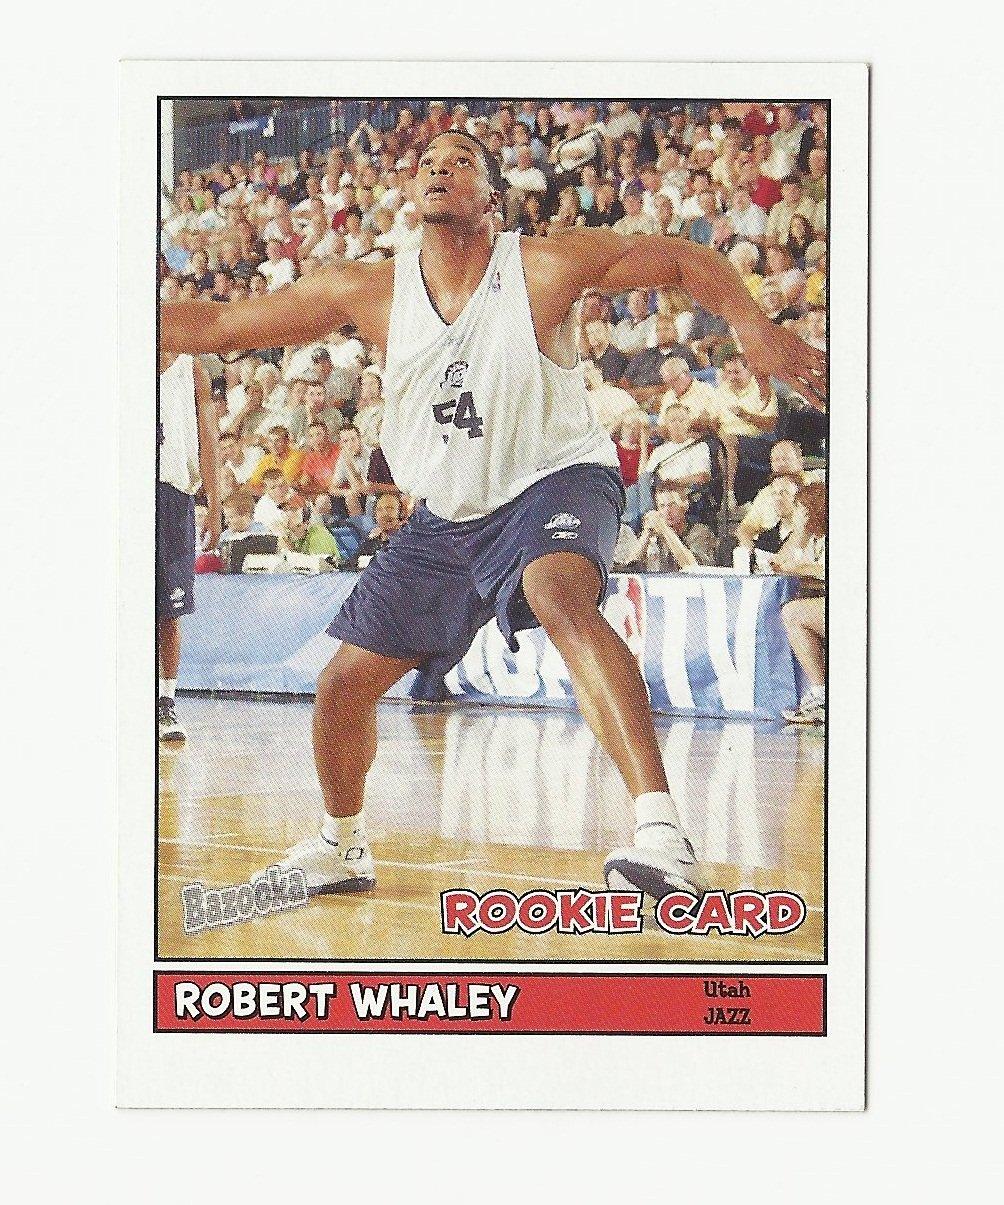 Robert Whaley 2005-06 Bazooka Mini Rookie Card #213 Utah Jazz